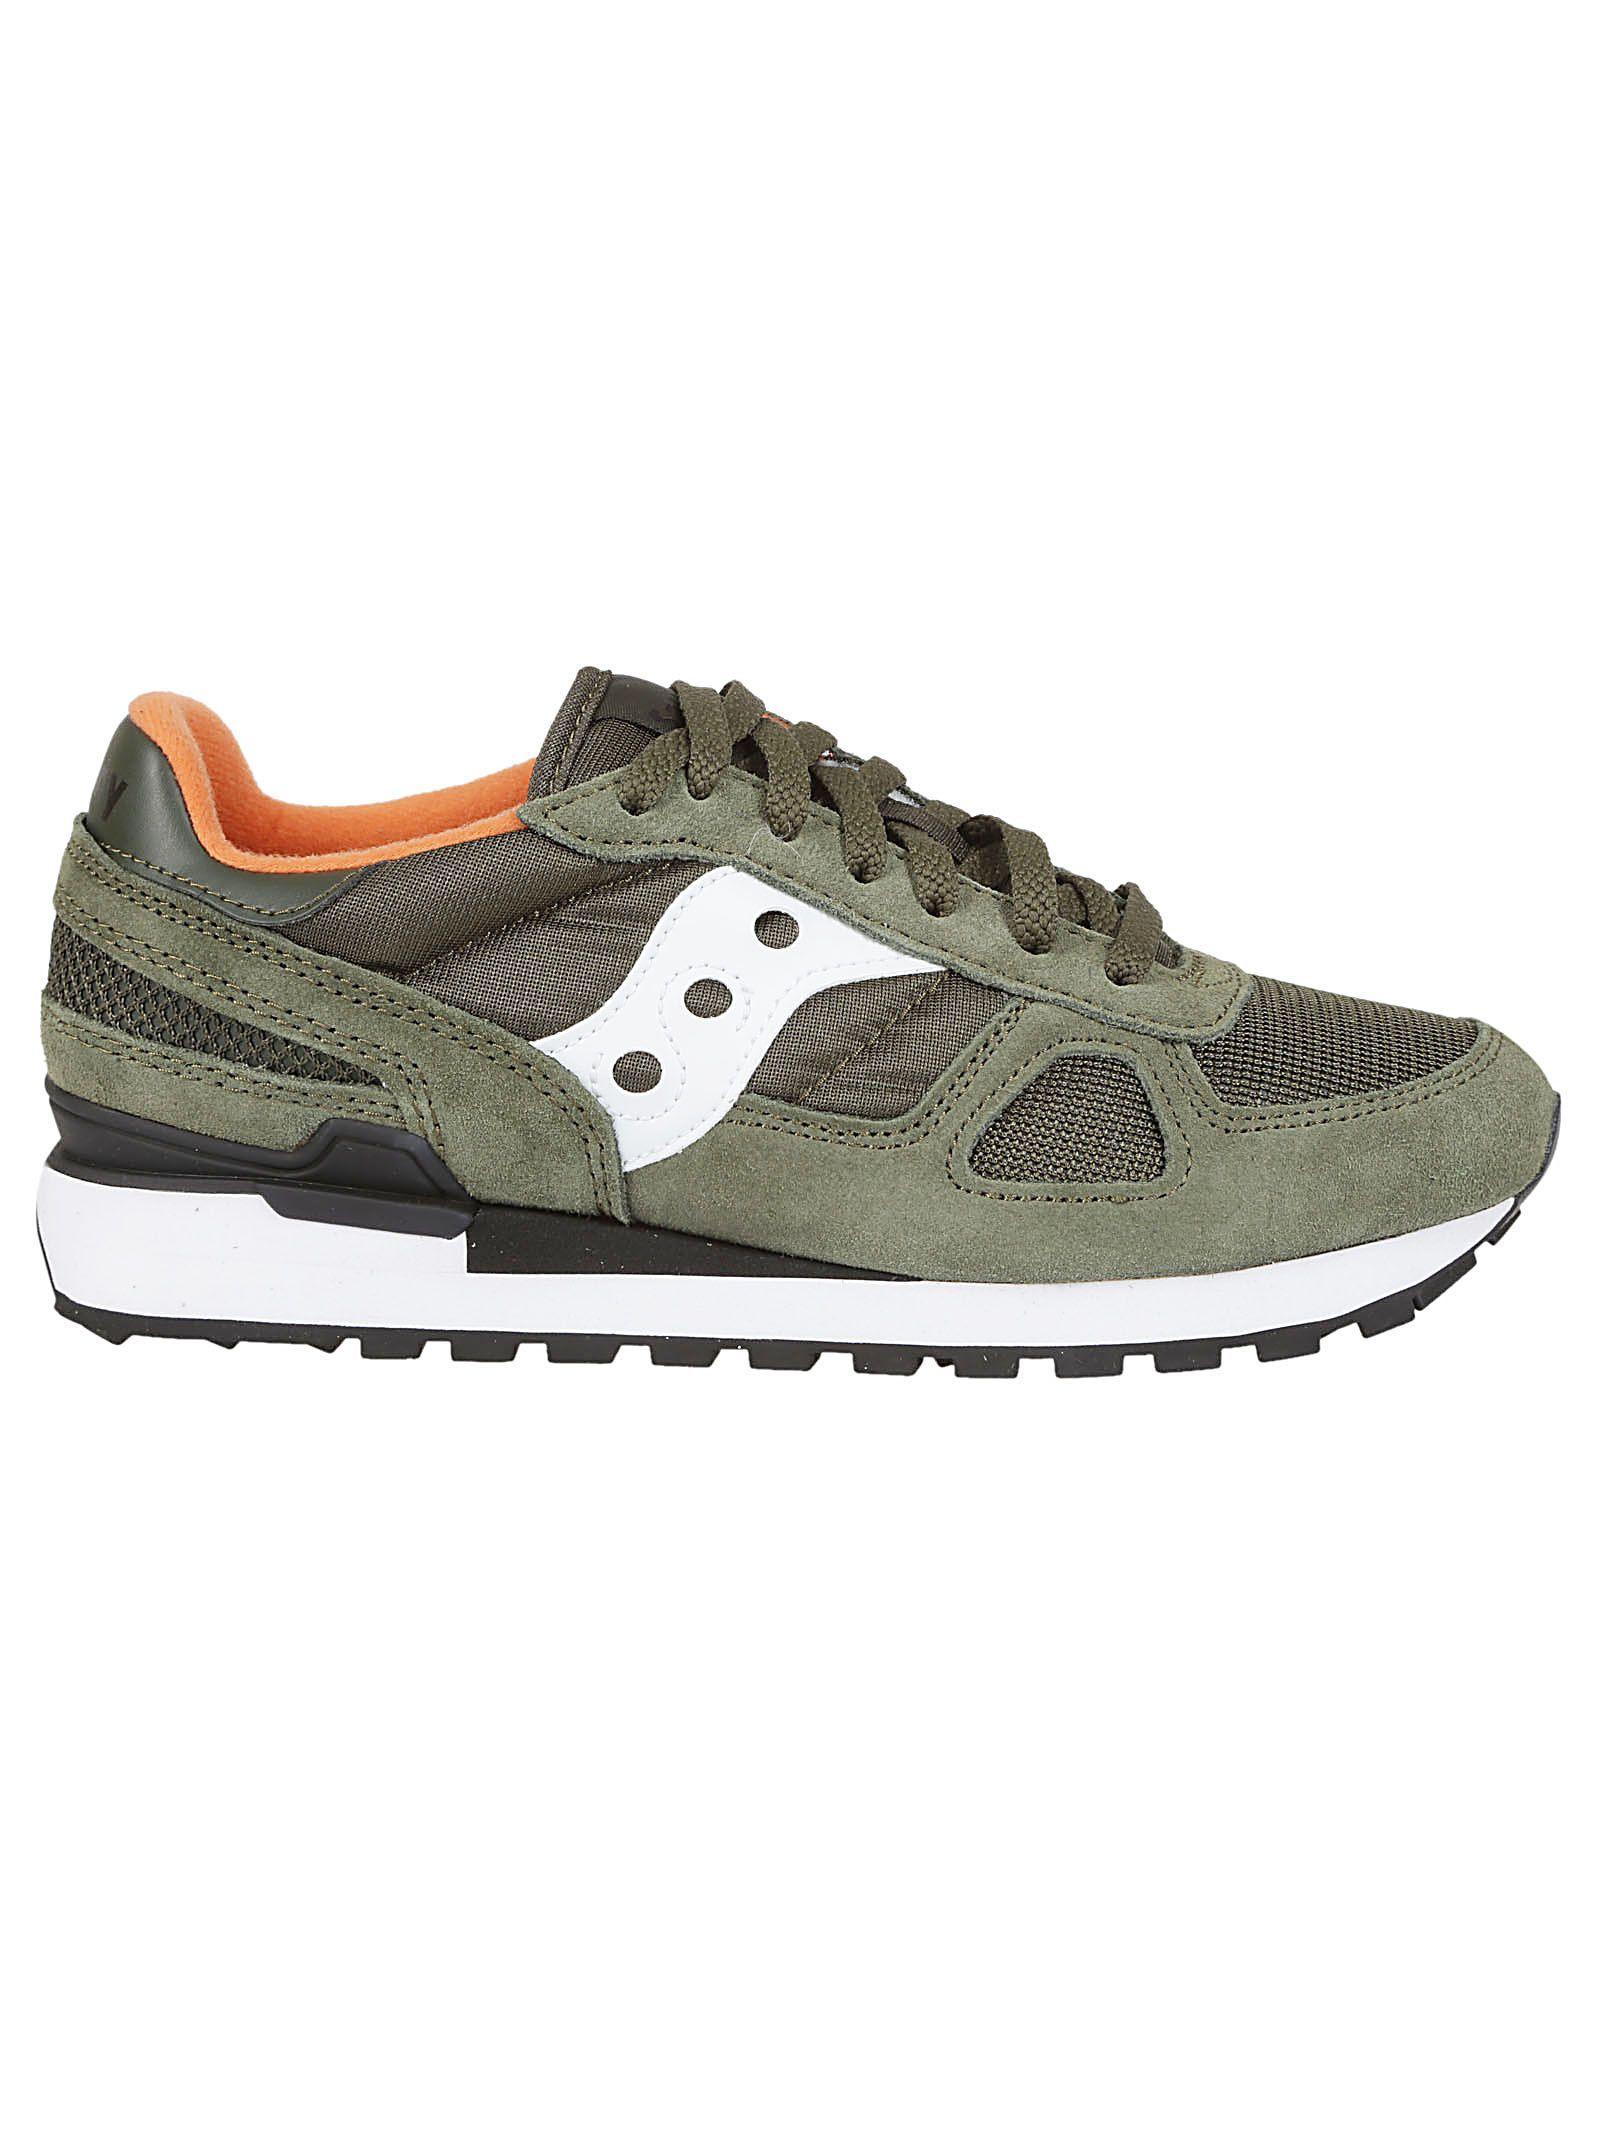 c0842b901569 SAUCONY LACE-UP SNEAKERS.  saucony  shoes